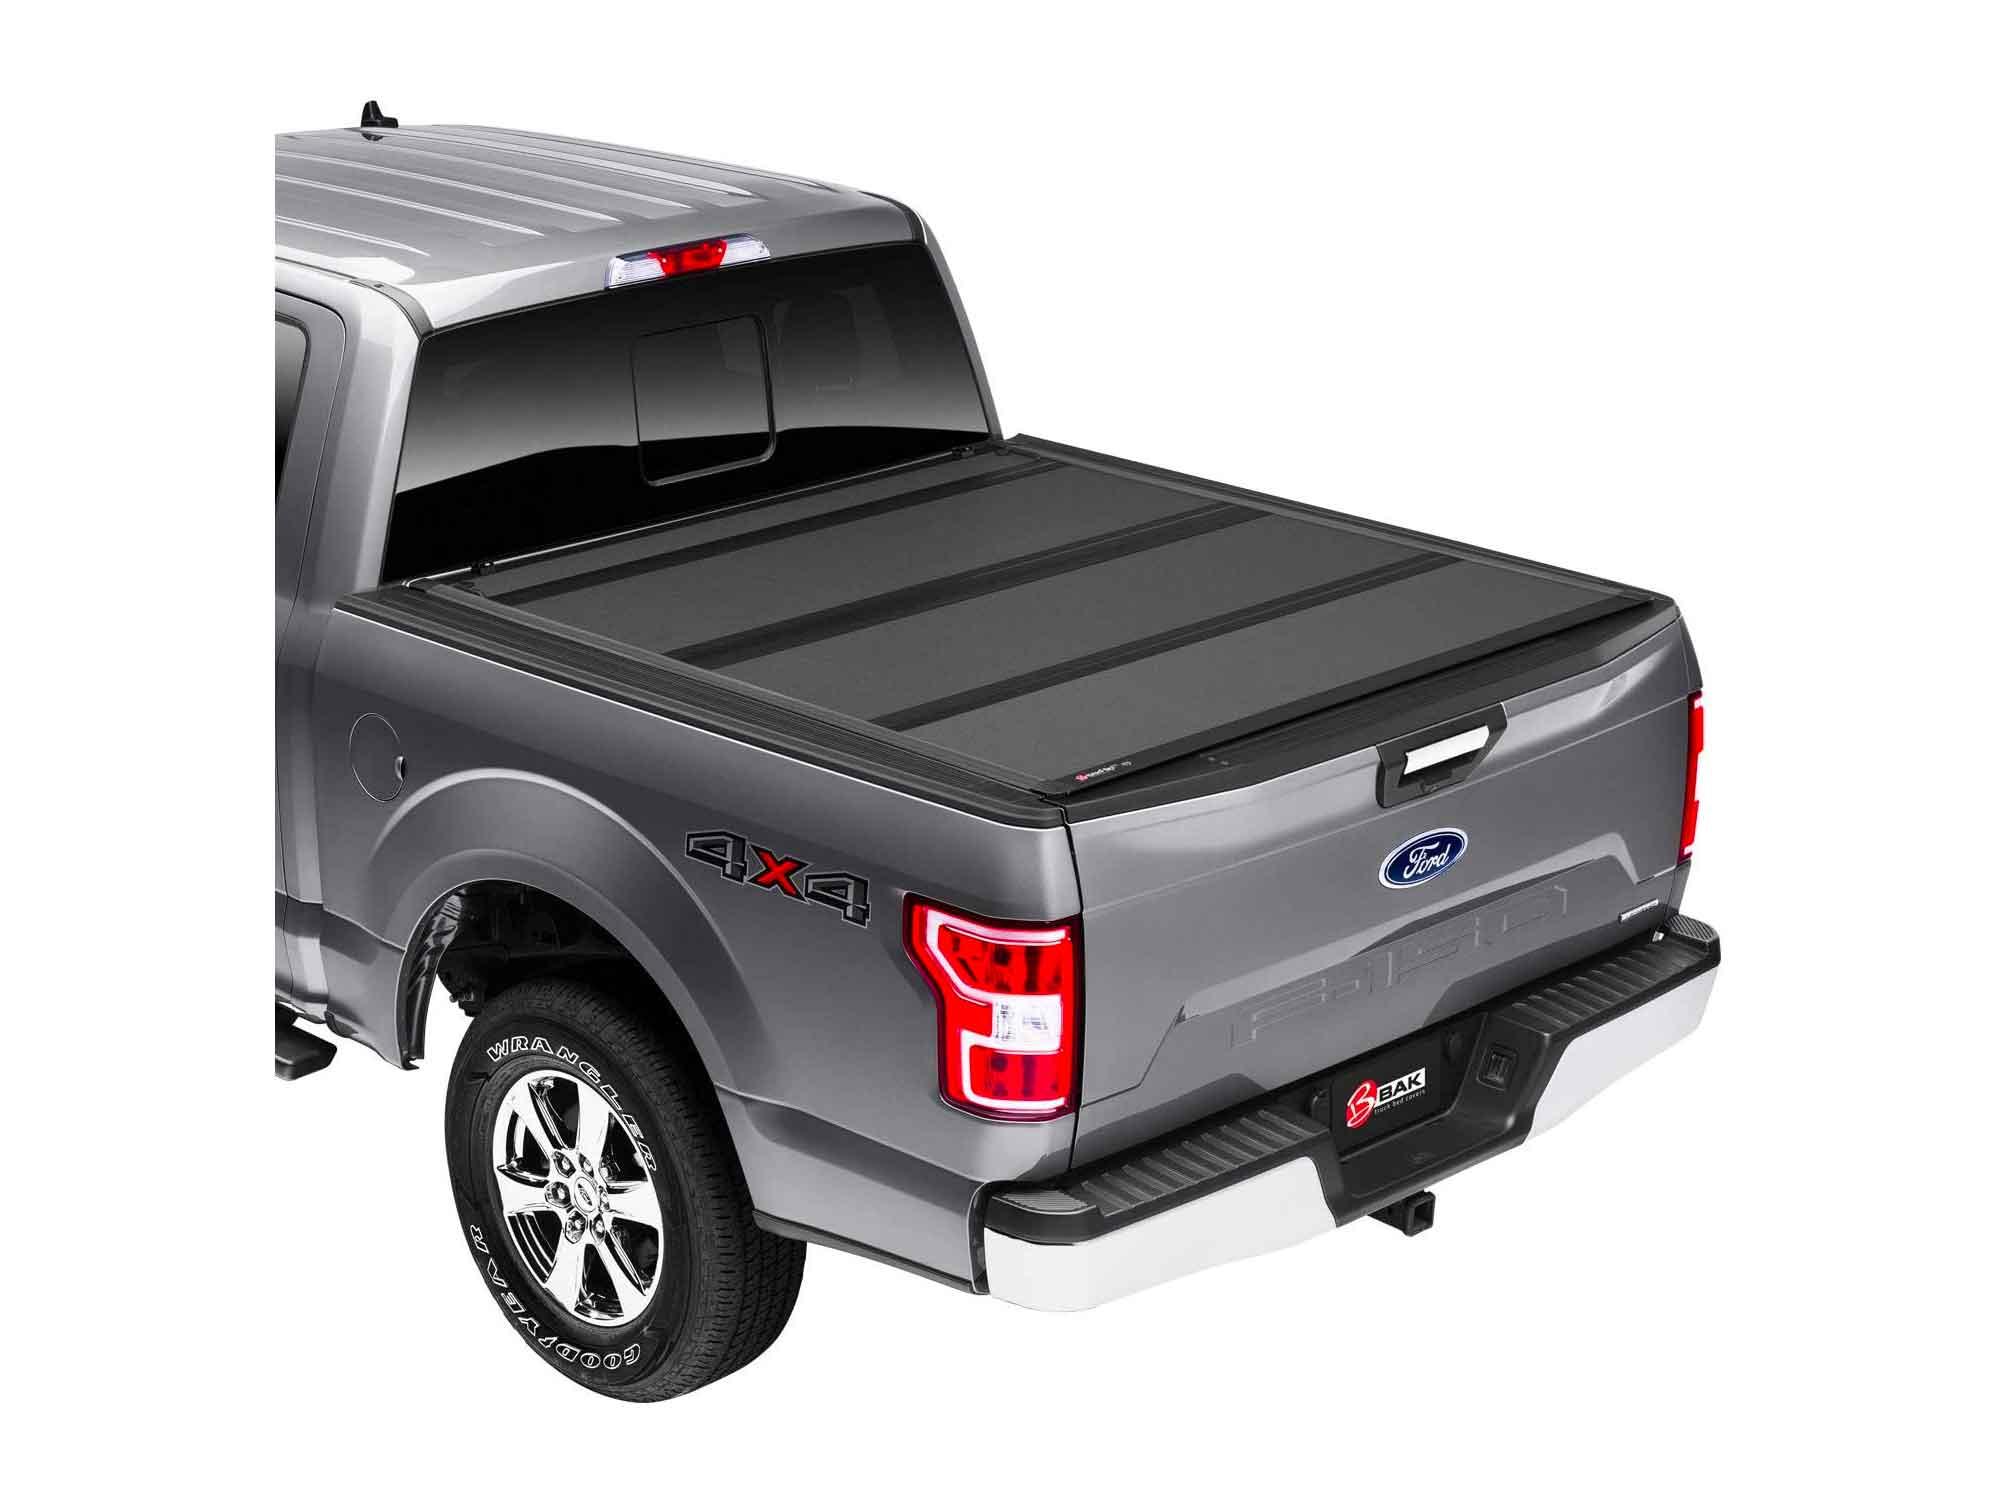 BAK BAKFlip MX4 Hard Folding Truck Bed Tonneau Cover | Fits 2015 - 2020 Ford F150 5' 7